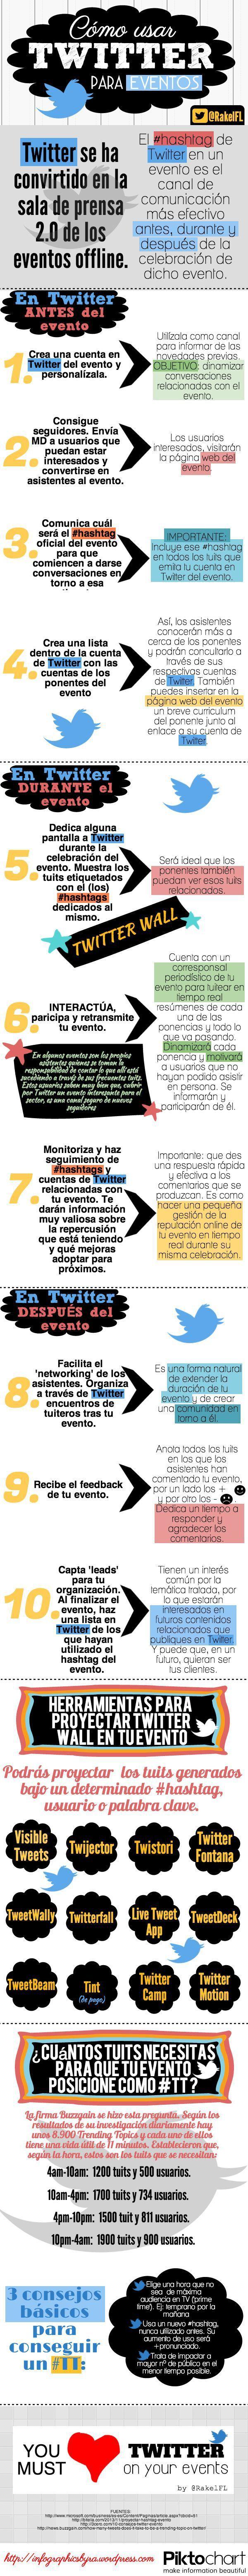 Com utilitzar #Twitter per esdeveniments. #Eventos #Infografia